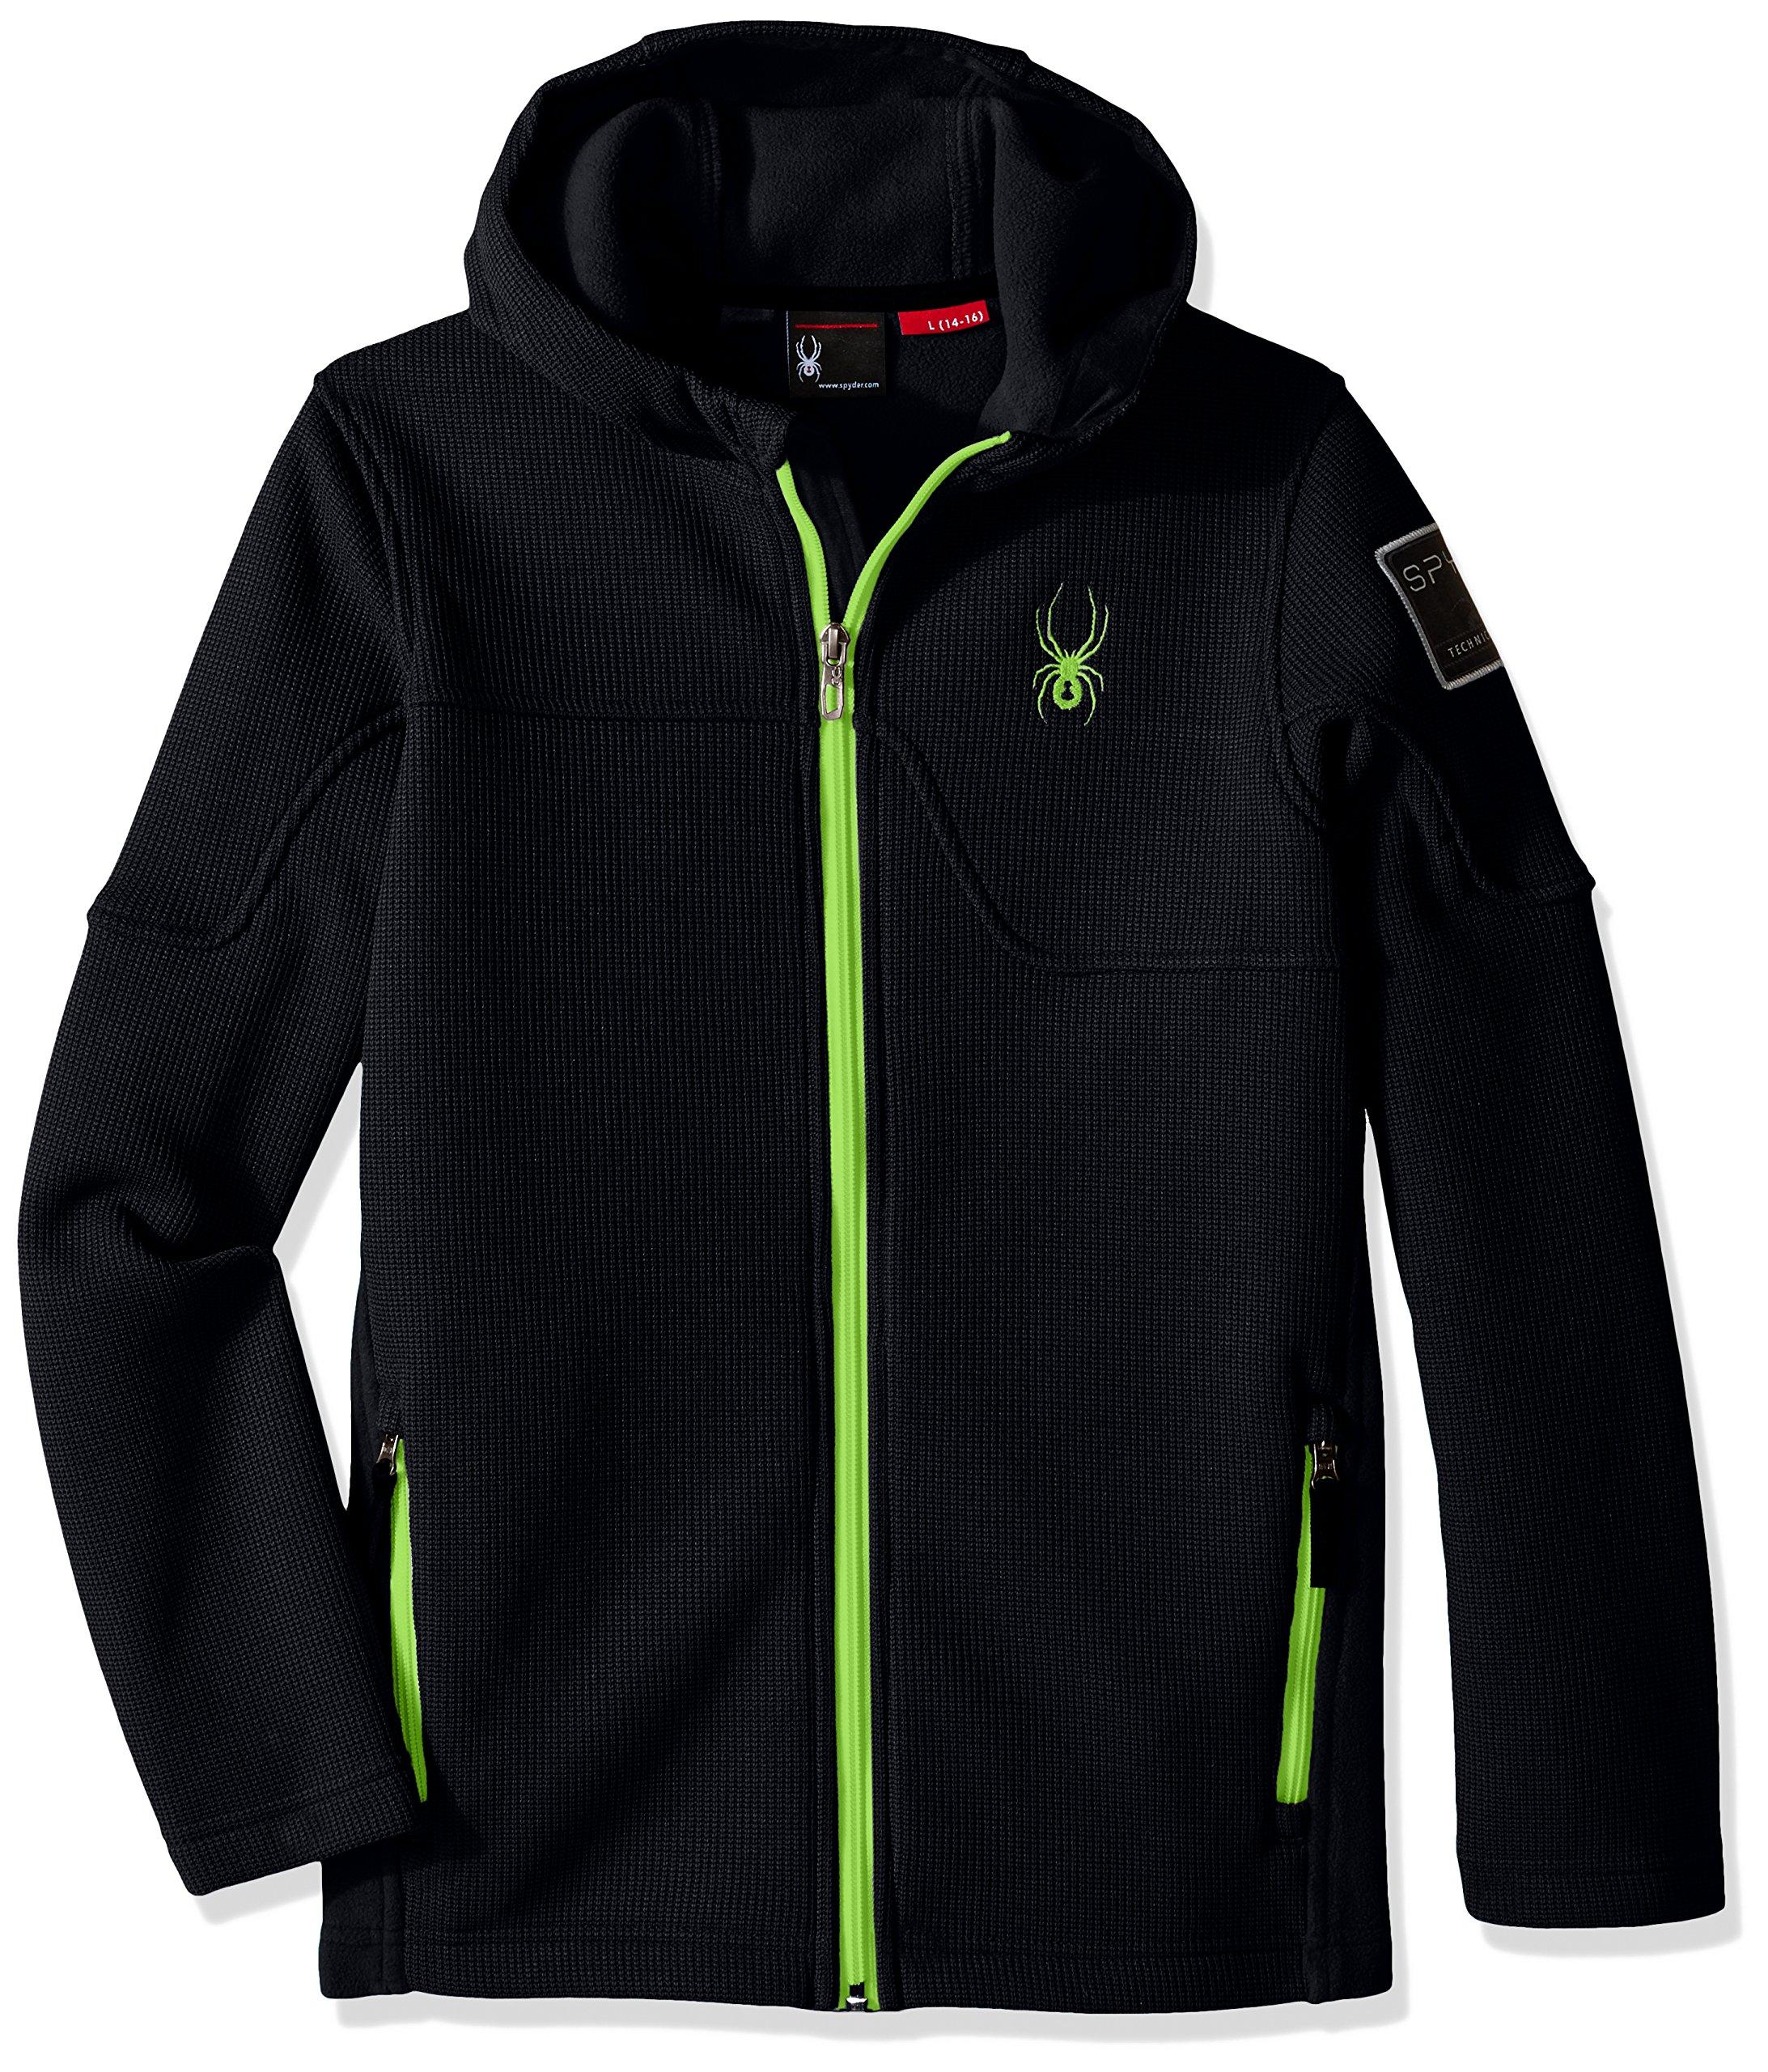 Spyder Boys Upward Mid WT Stryke Fleece Shirt, Black/Bryte Green, Small